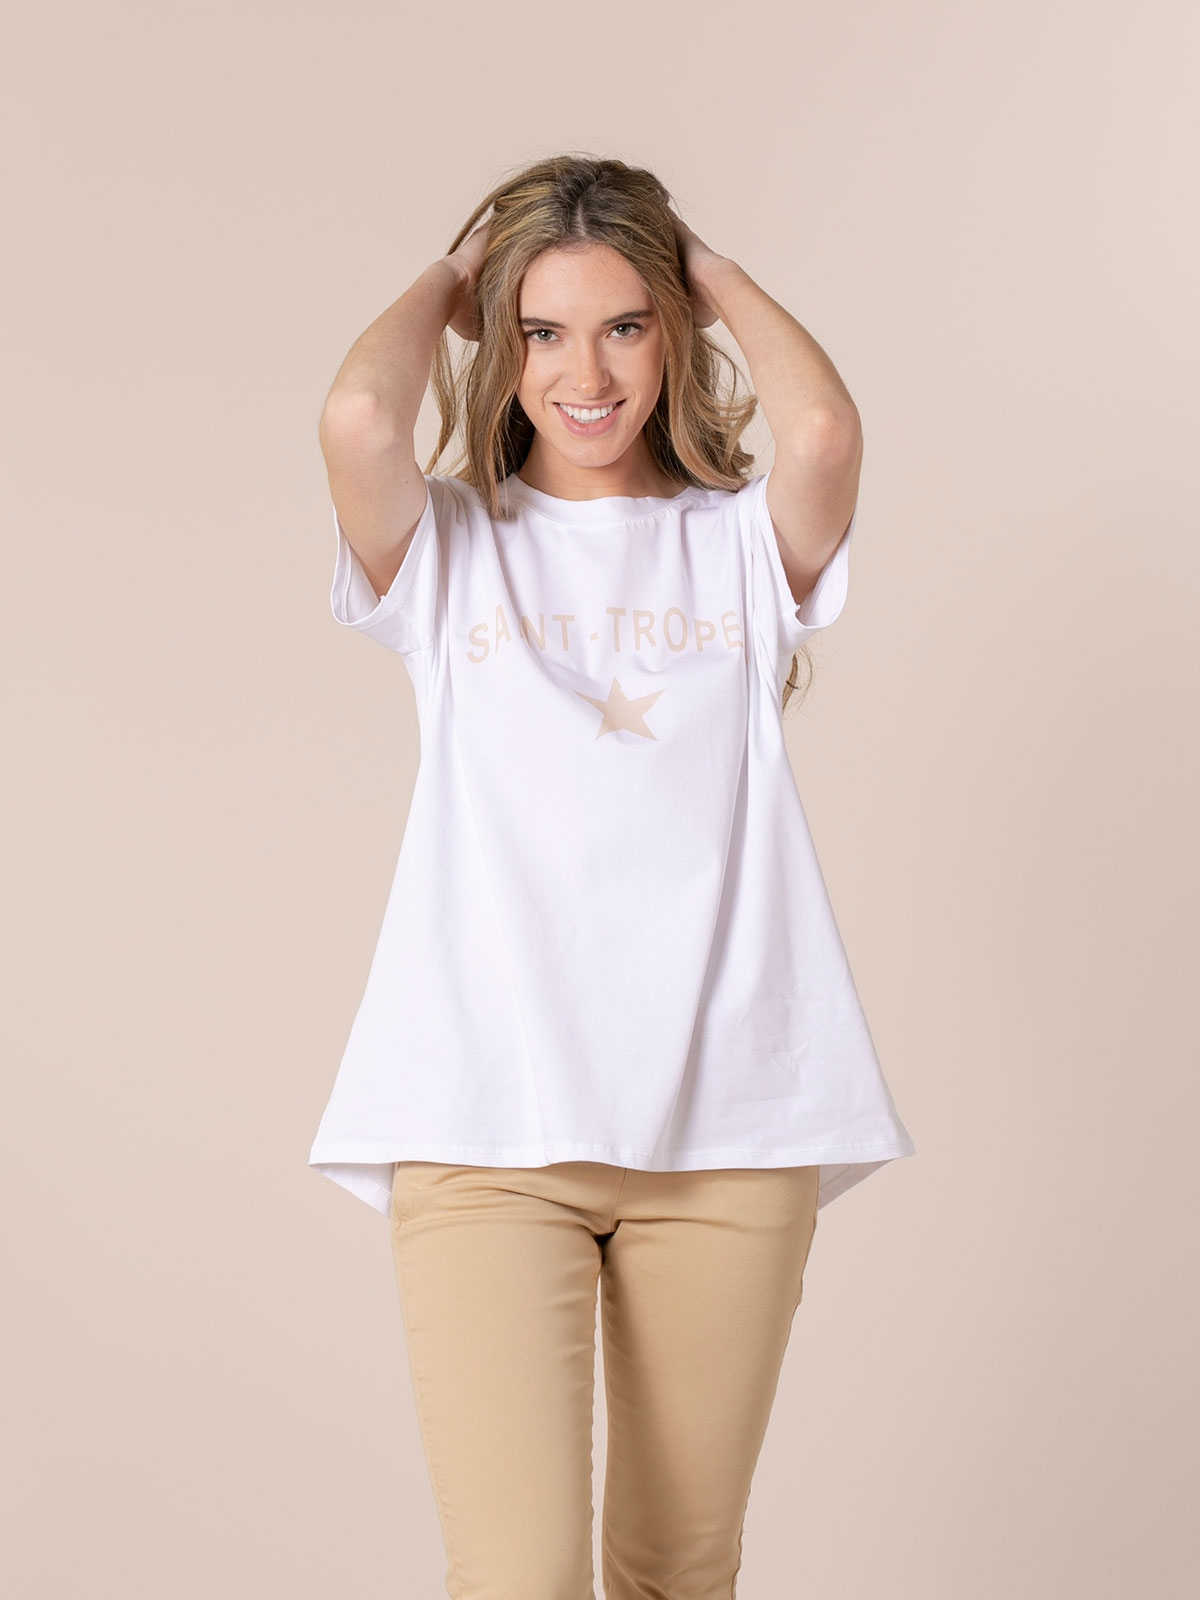 Woman St tropez message organic t-shirt Beige